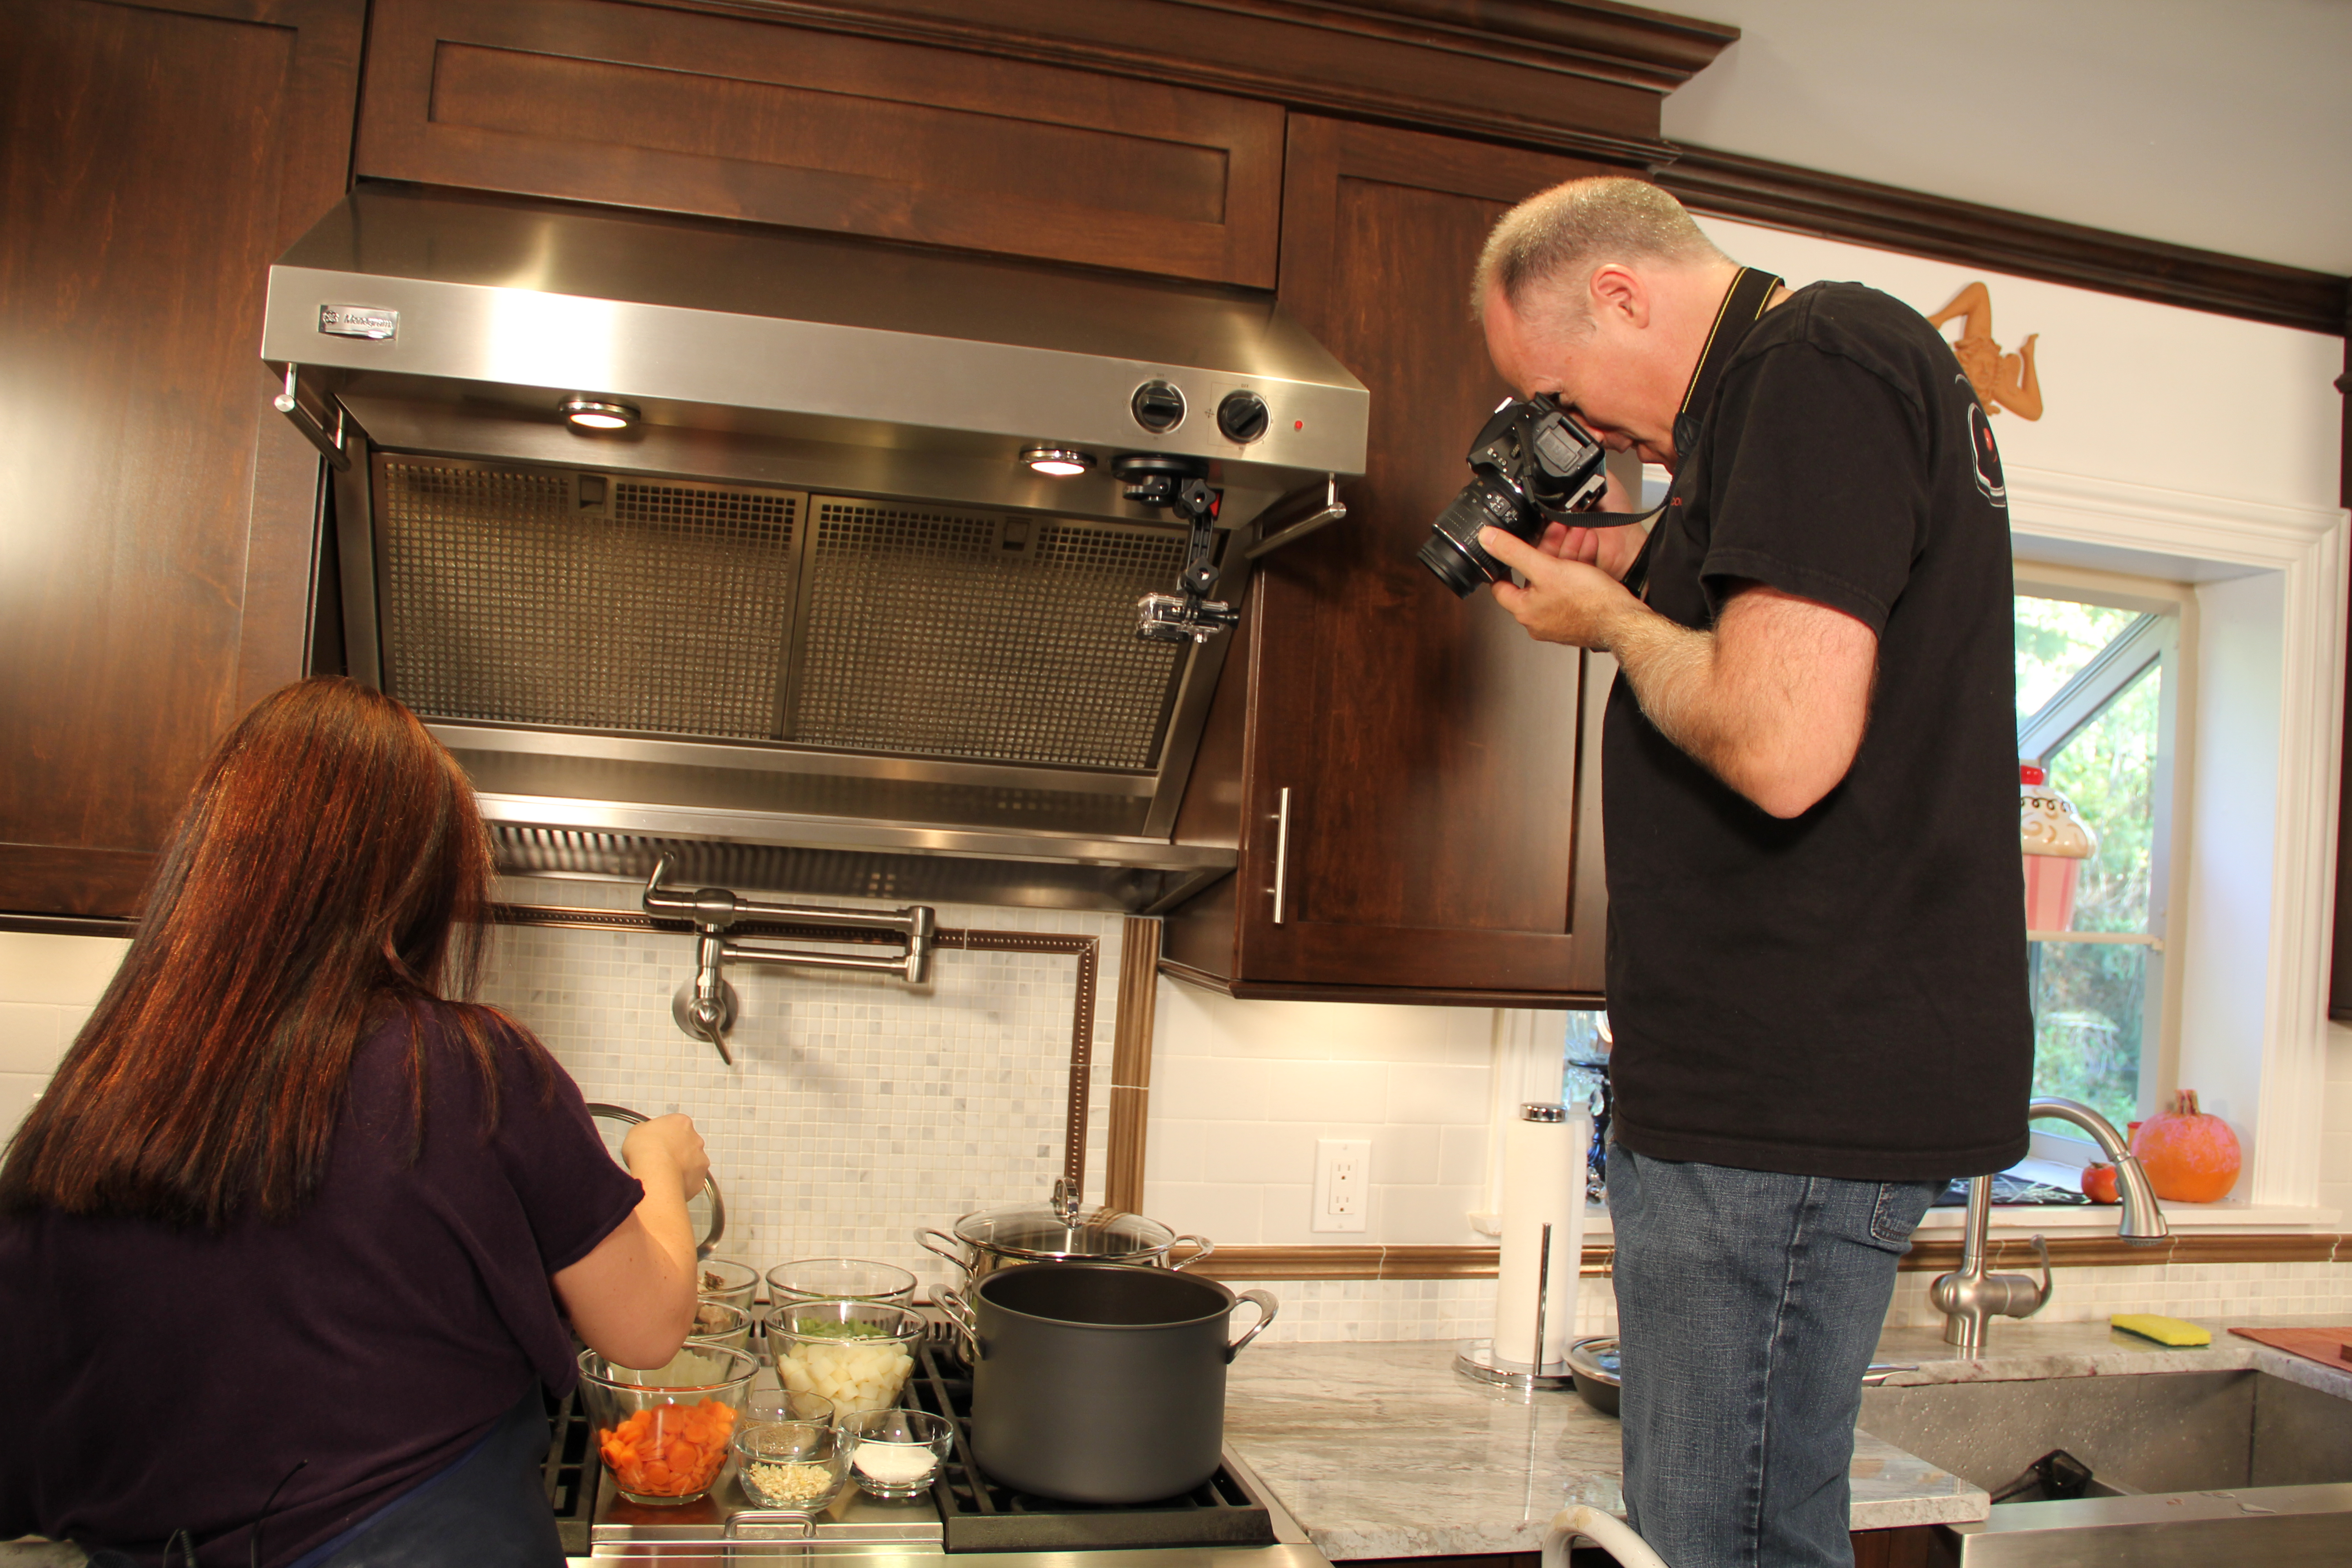 Video_SEO_Pro-SocialBites-Cooking-Show-001